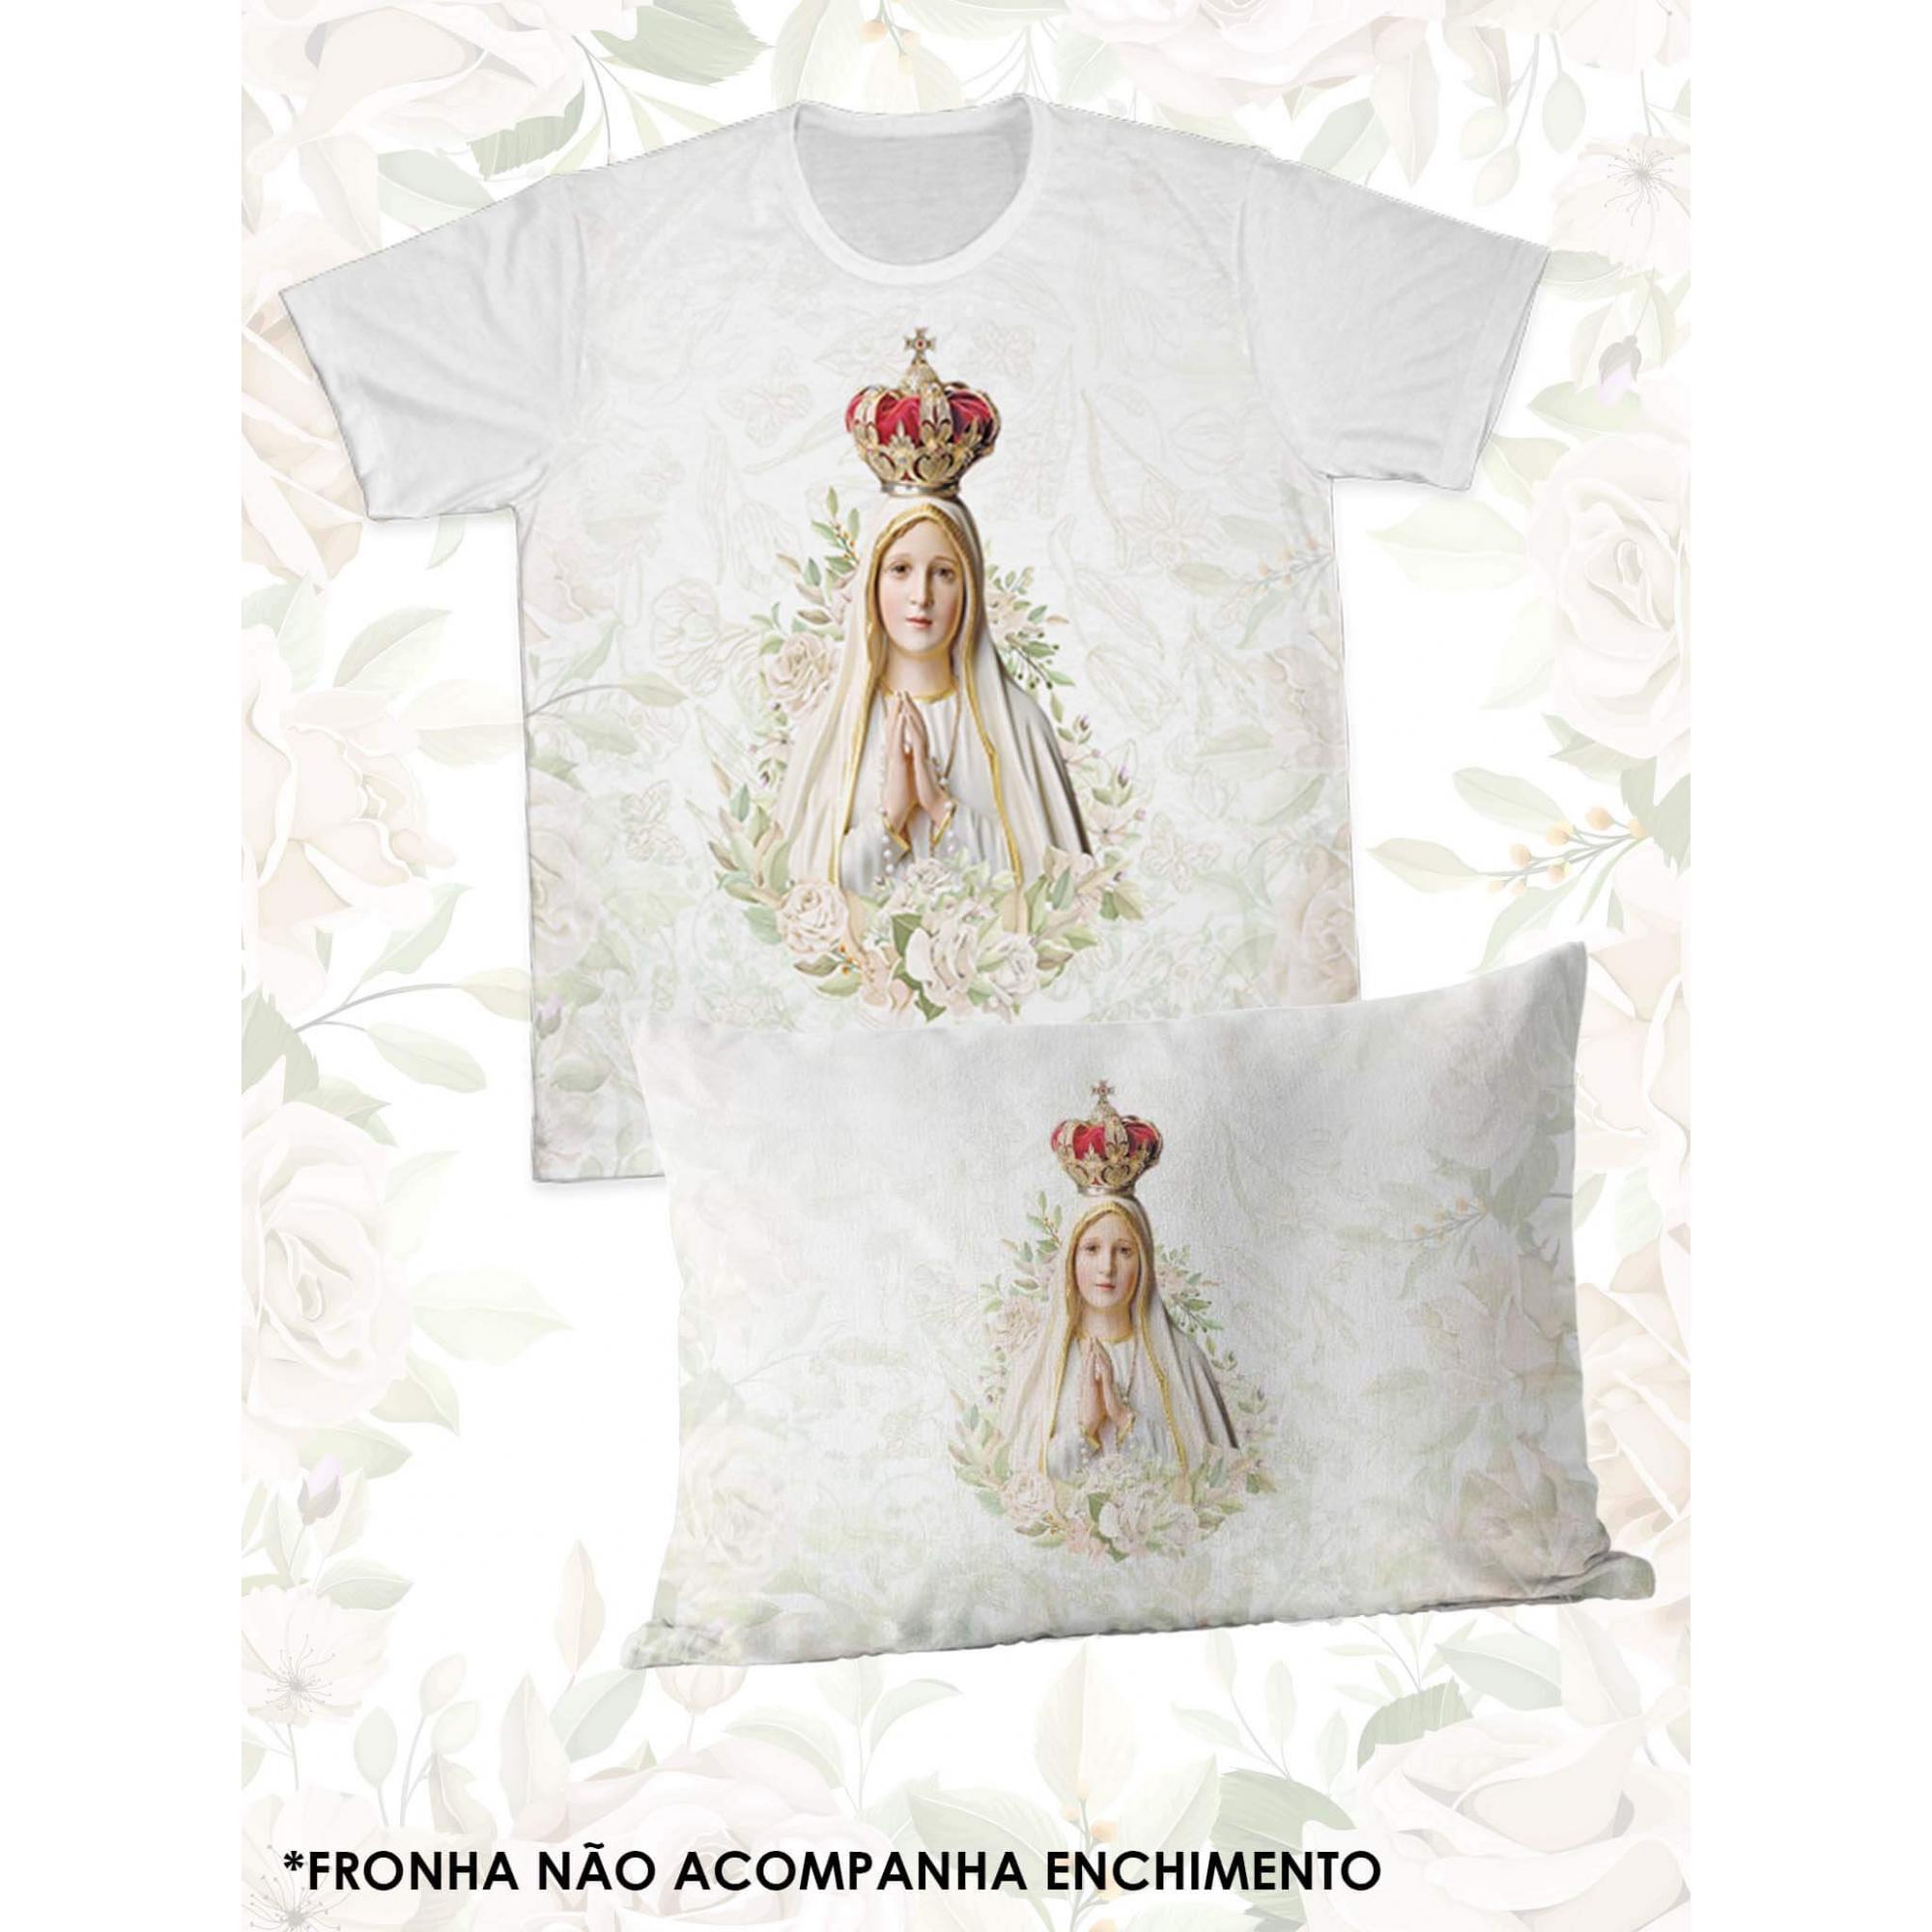 Ref. 0460 - Kit - Nossa Senhora de Fátima